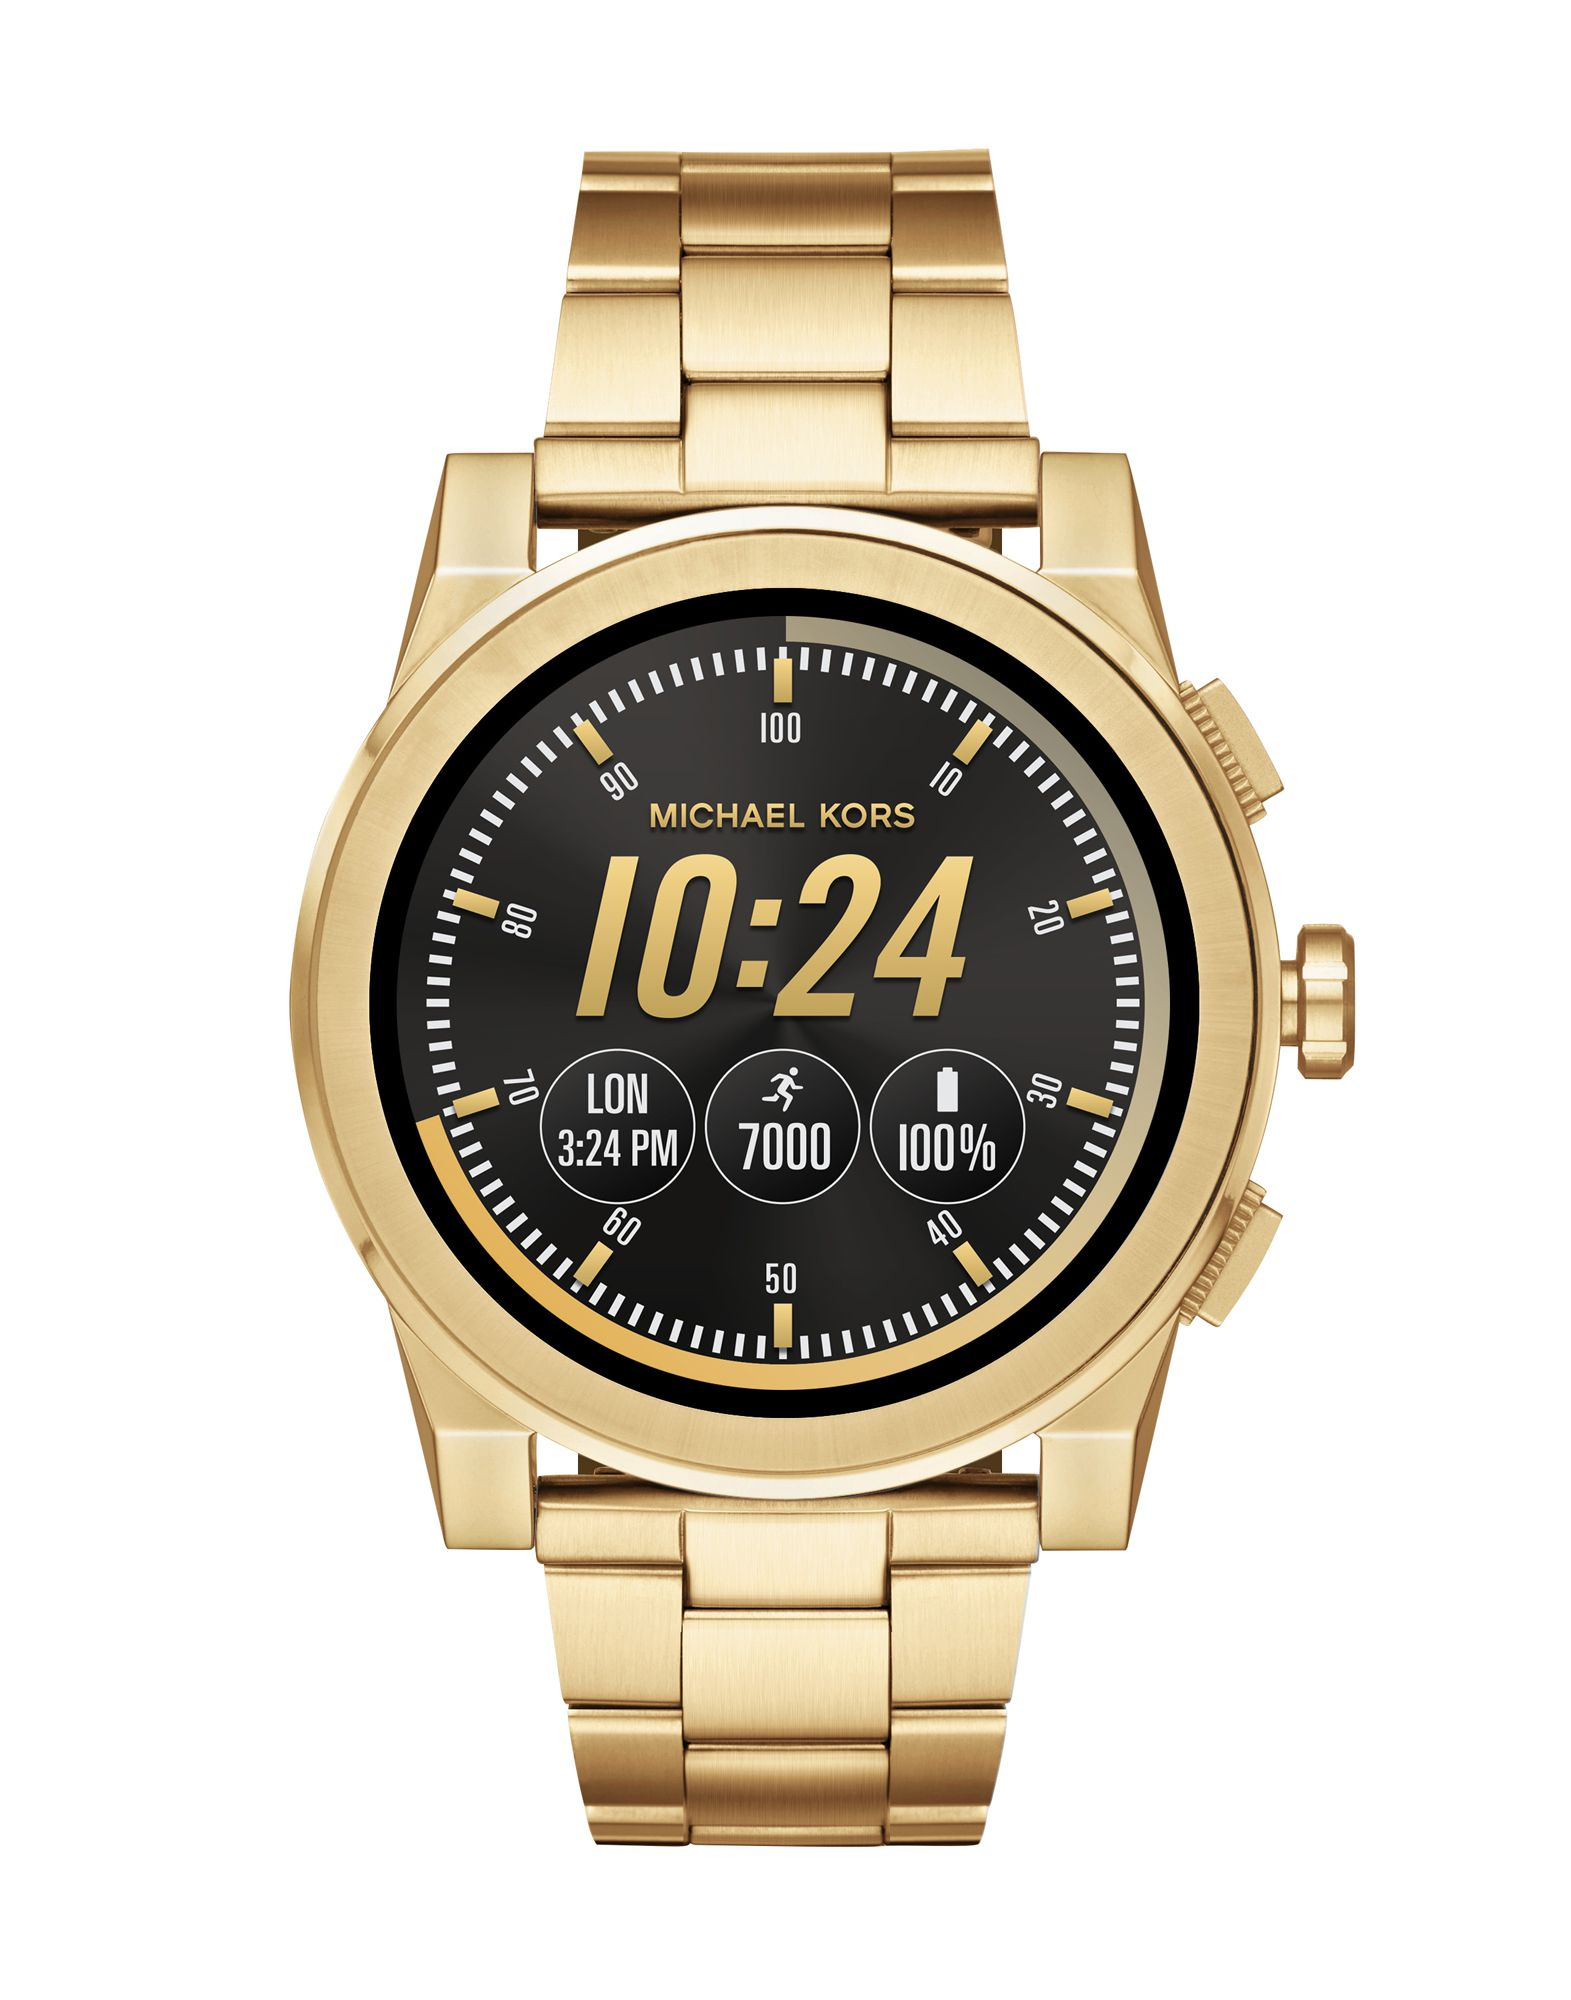 MICHAEL KORS ACCESS Herren Smartwatch Farbe Gold Größe 1 - broschei